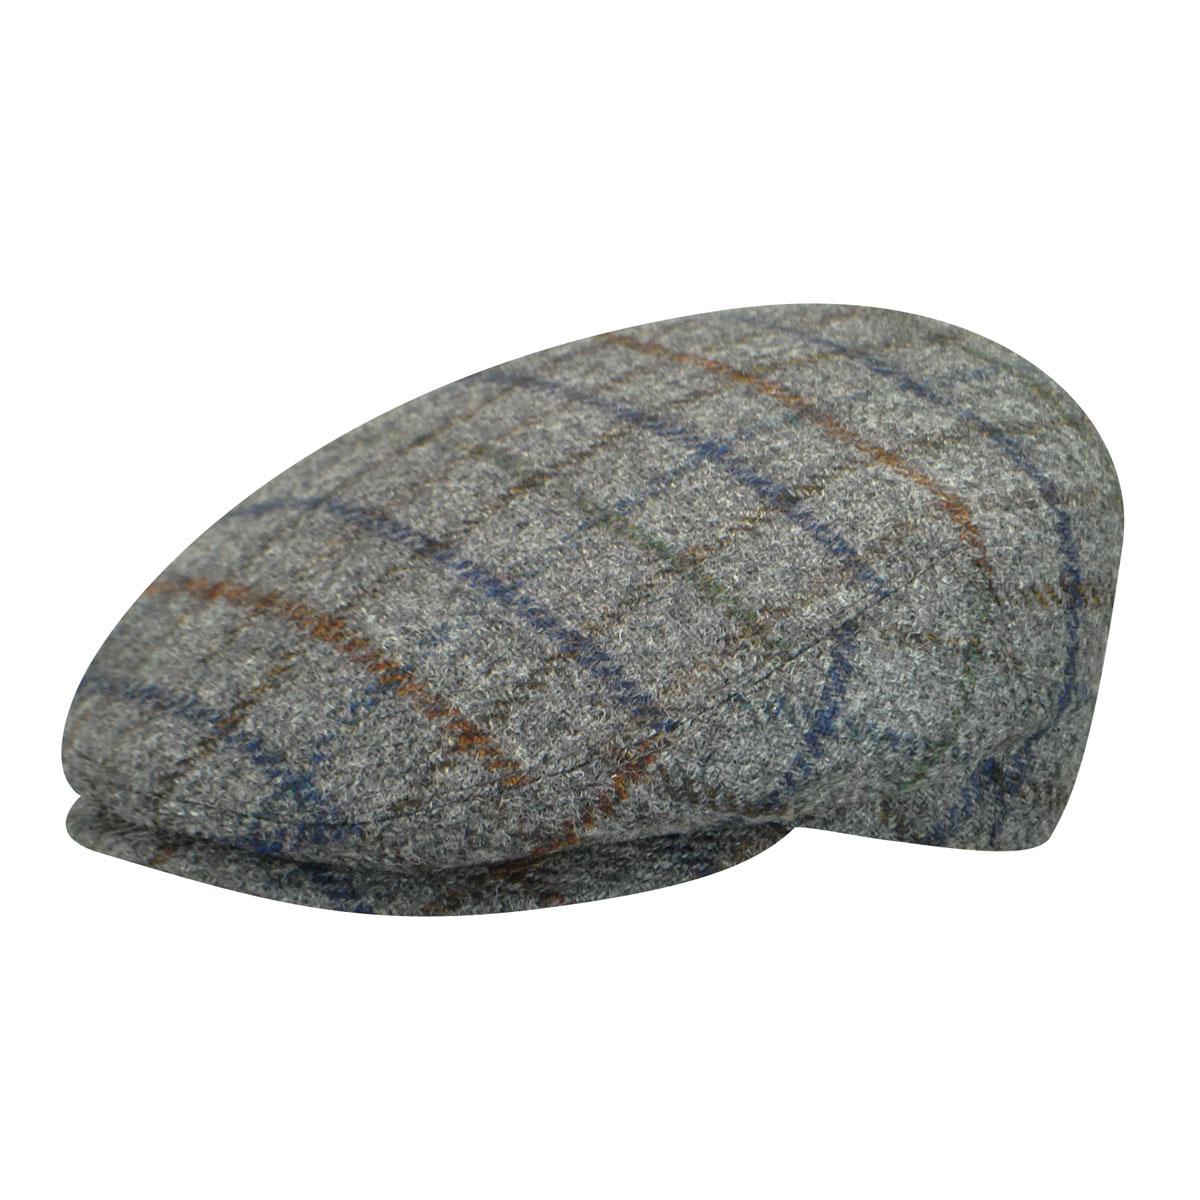 Men's Vintage Style Hats, Retro Hats BB160430017 Wool Ivy Cap $93.75 AT vintagedancer.com